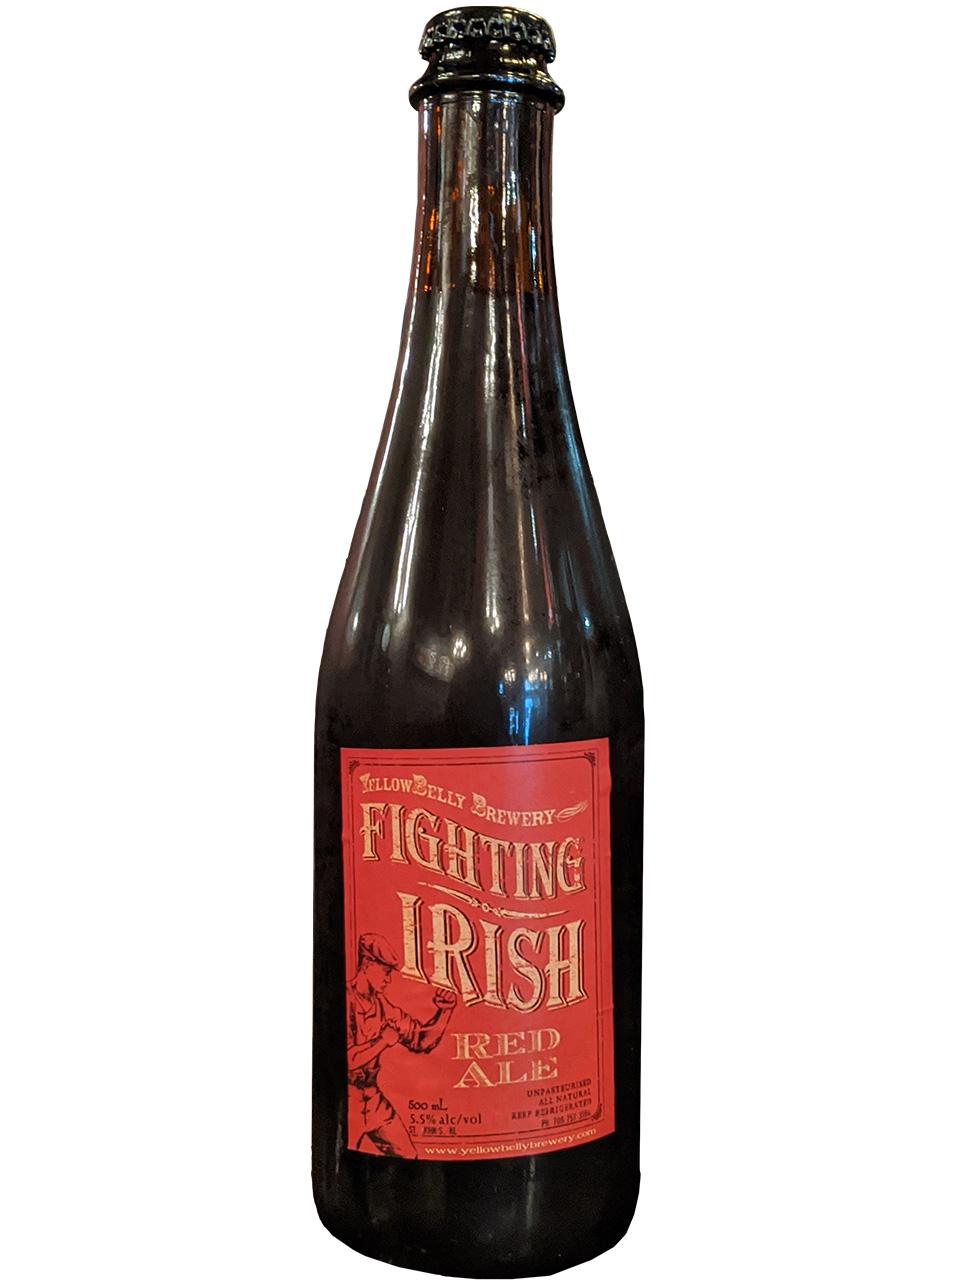 YellowBelly Fighting Irish Red Ale 500ml Bottle